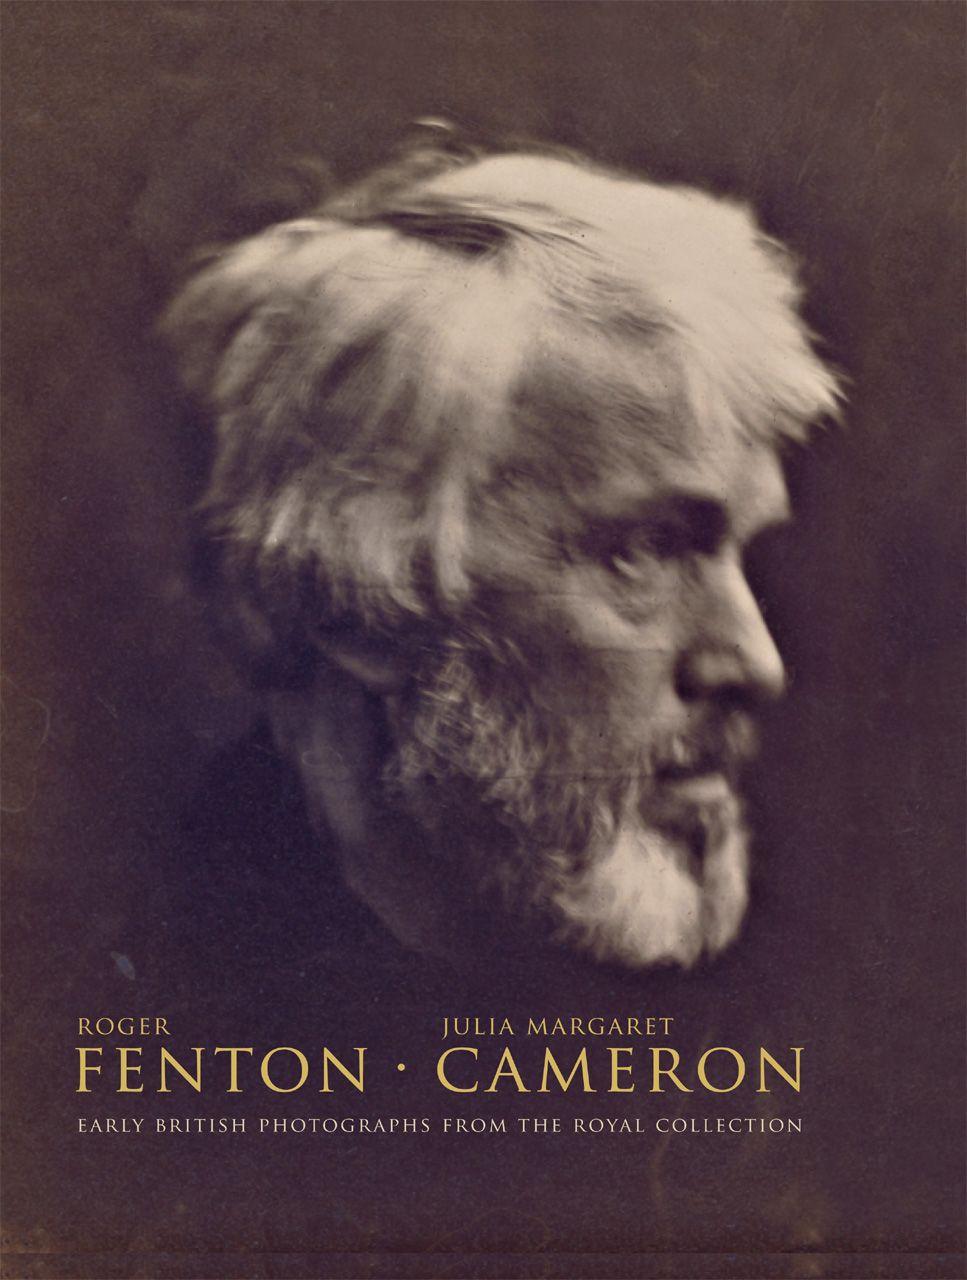 Roger Fenton * Julia Margaret Cameron